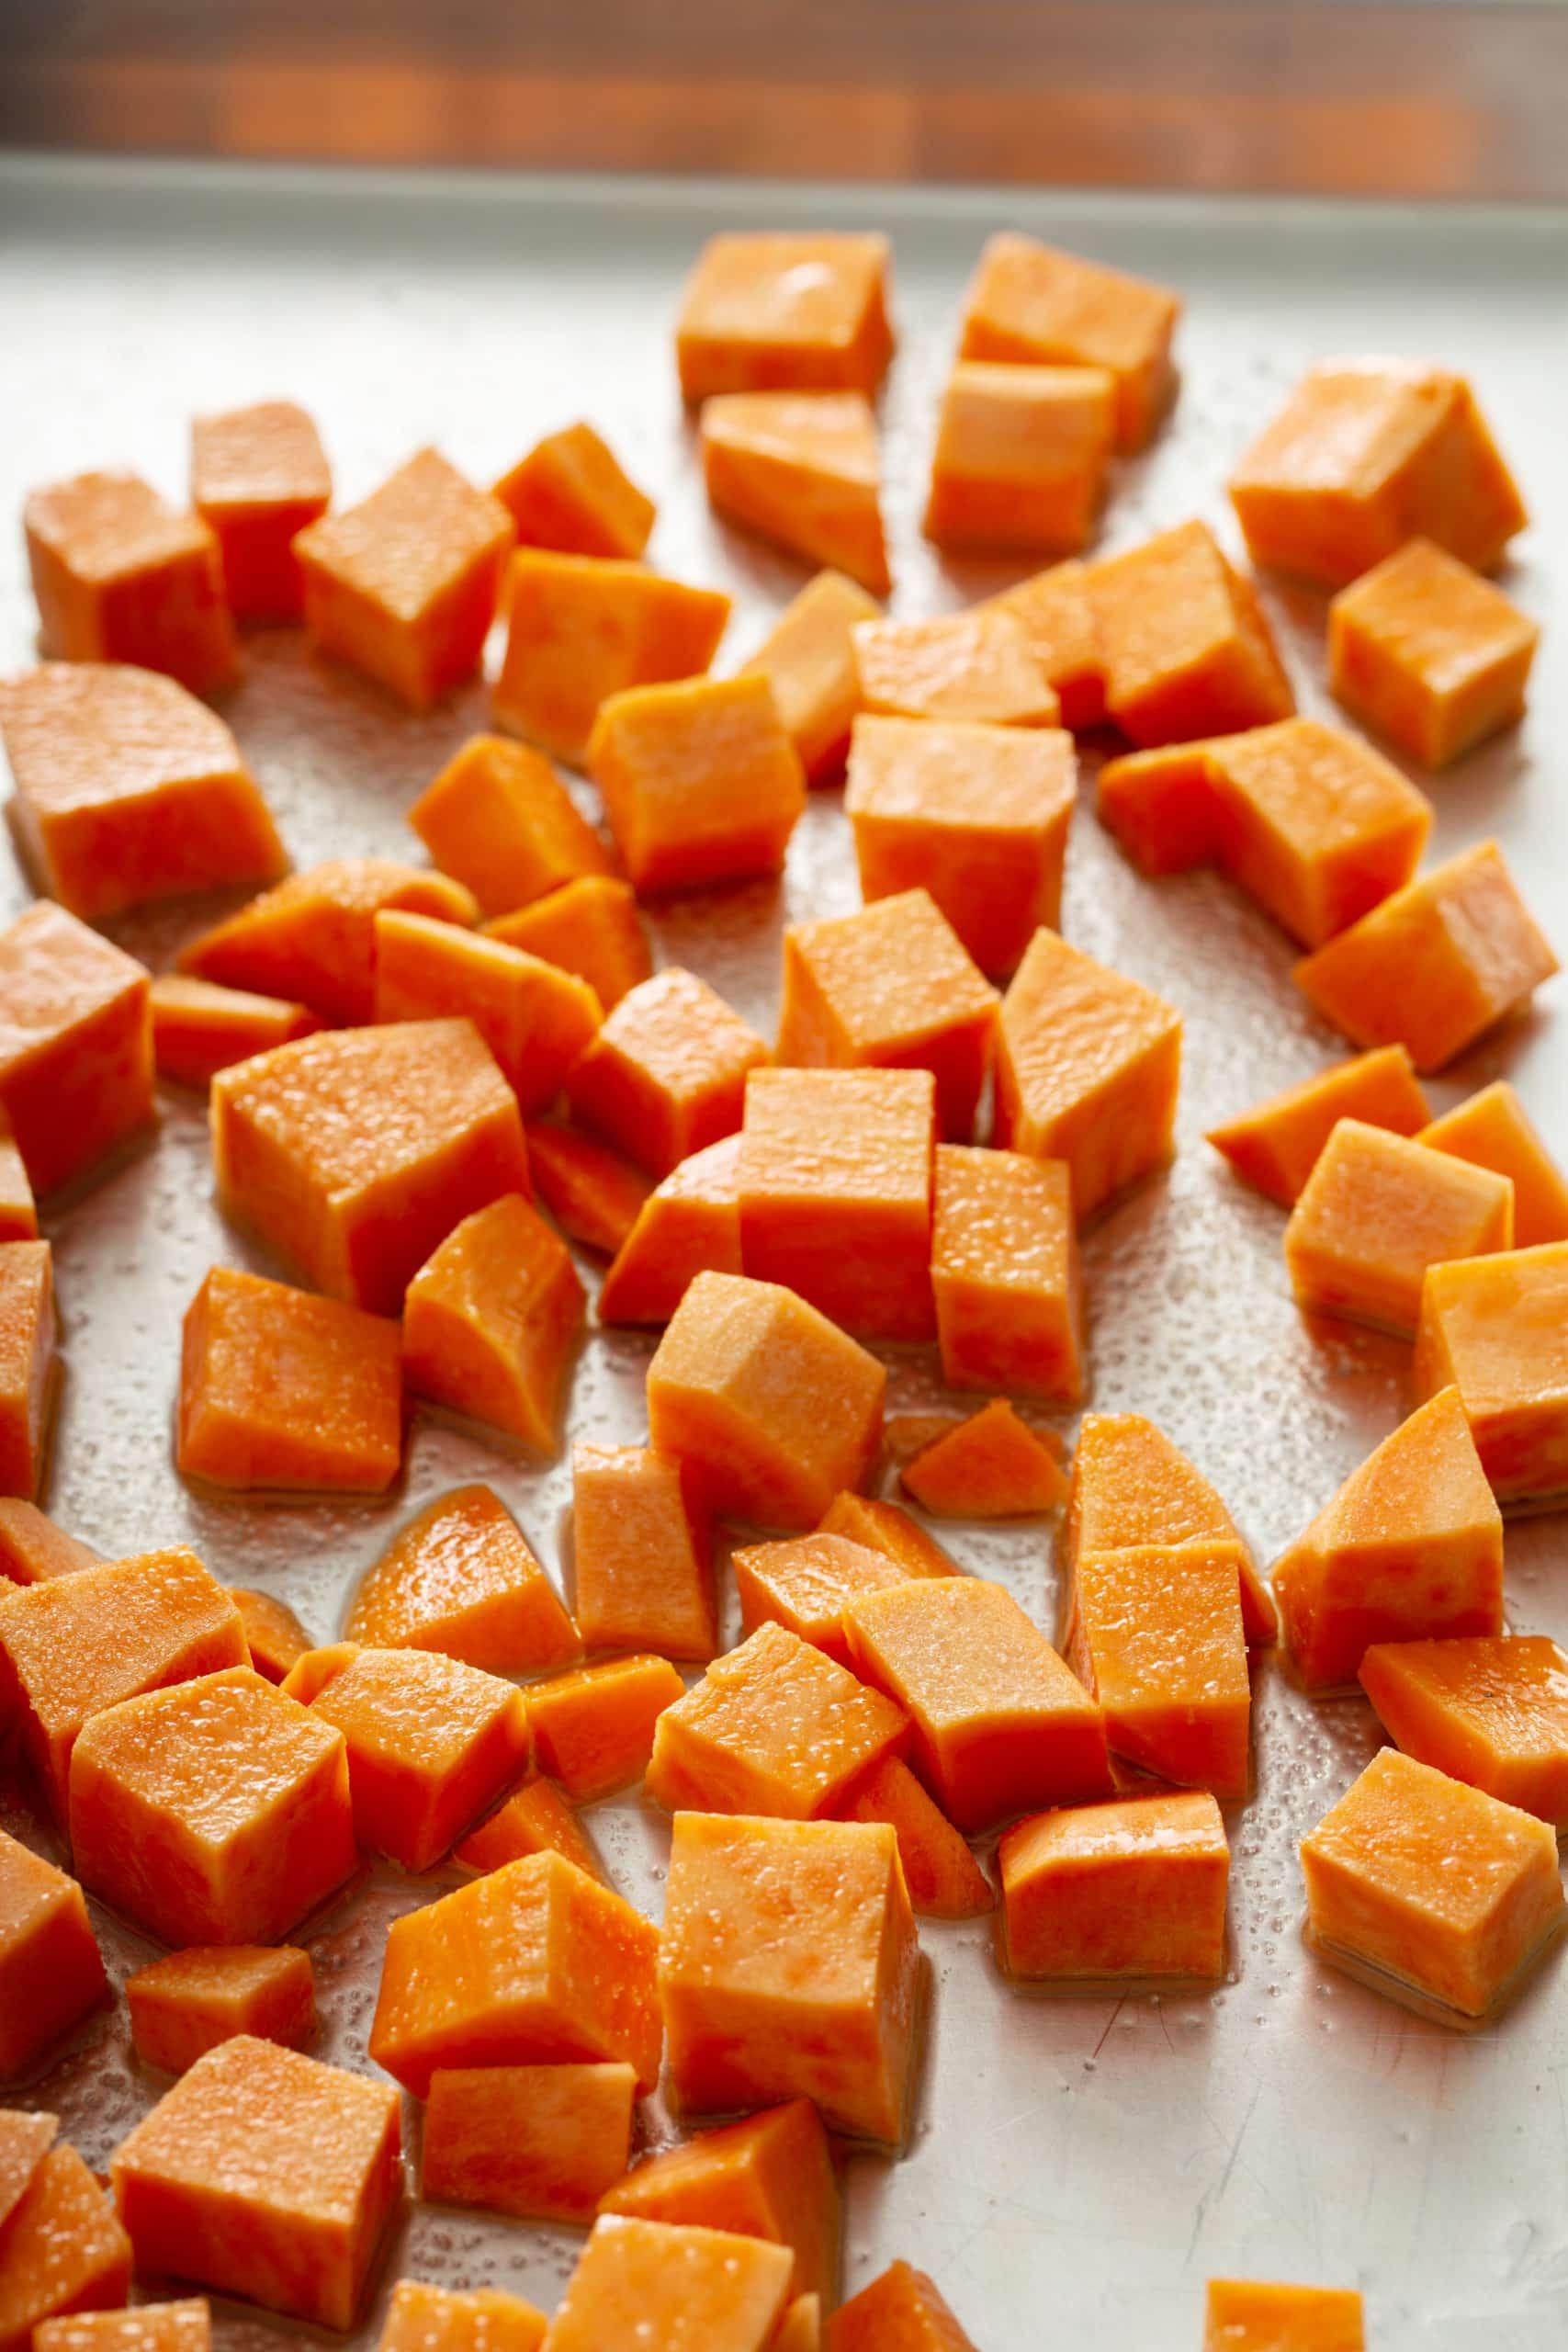 Cubed sweet potatoes.